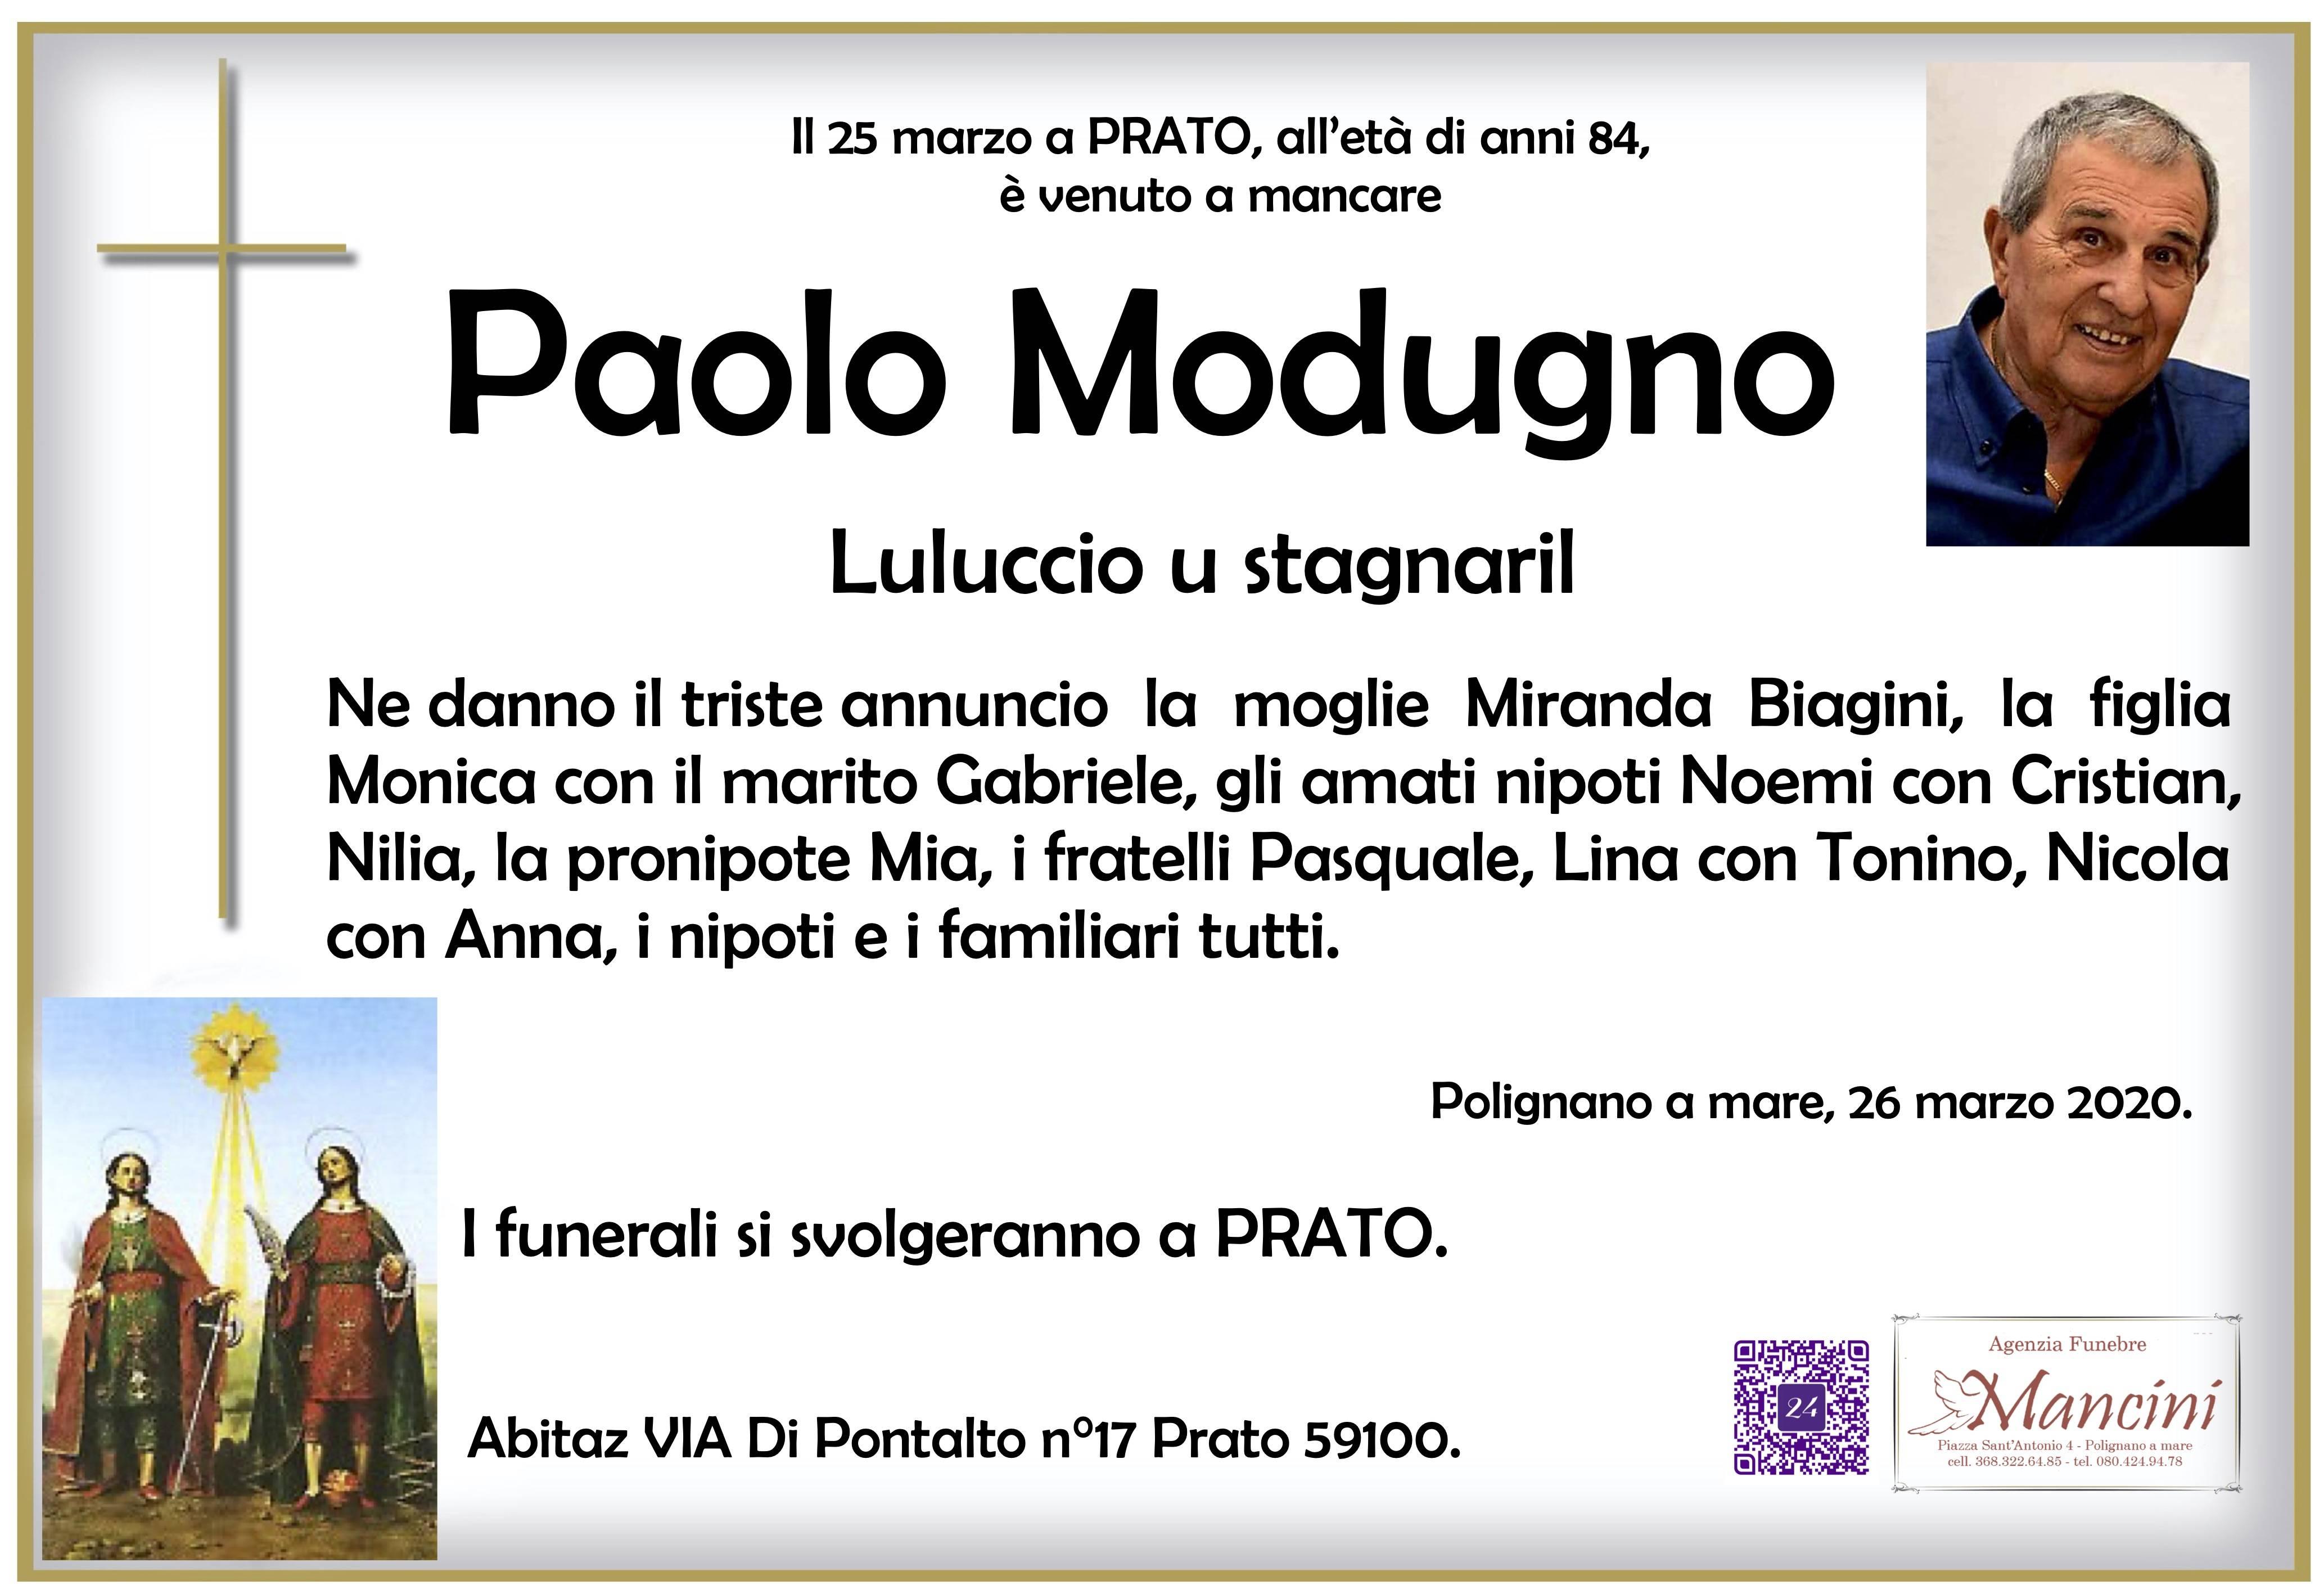 Paolo Modugno